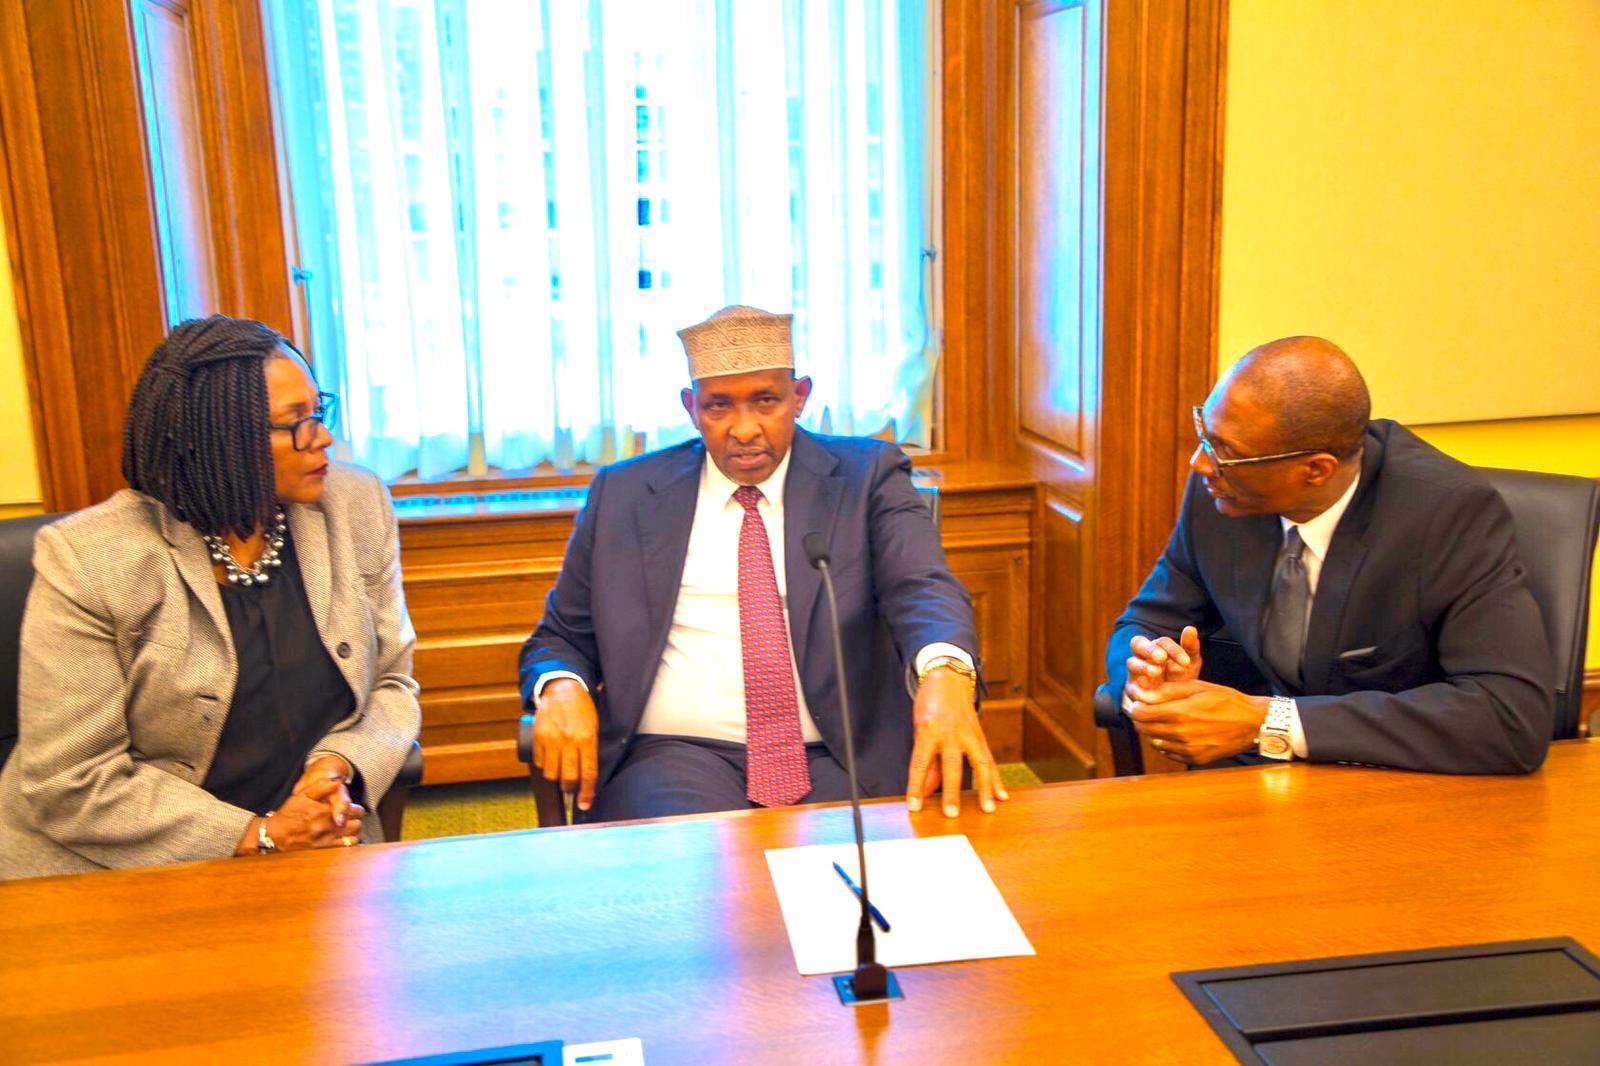 Hon. Aden Duale Meets With Rep. Rena Moran and Senator Bobby Jo Champion